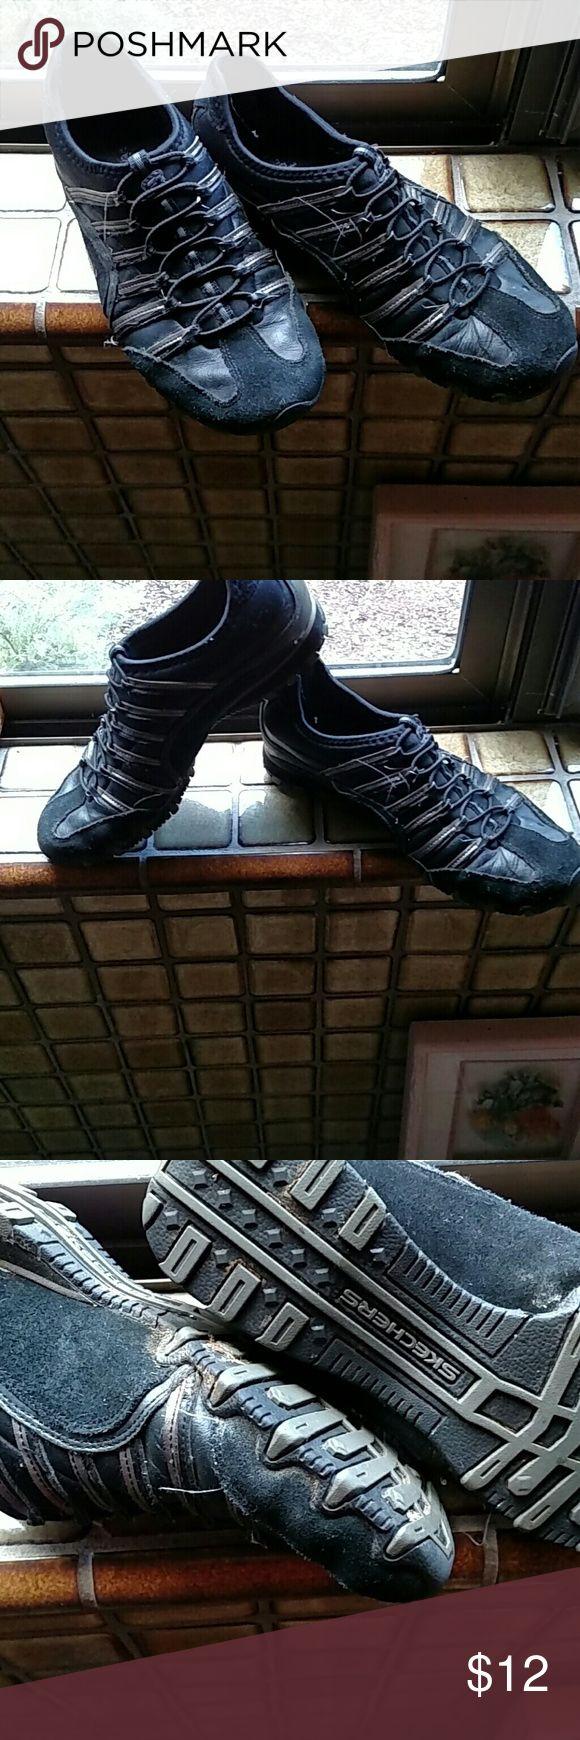 Gently worn Sketchers sneakers Comfortable Shoes Sneakers